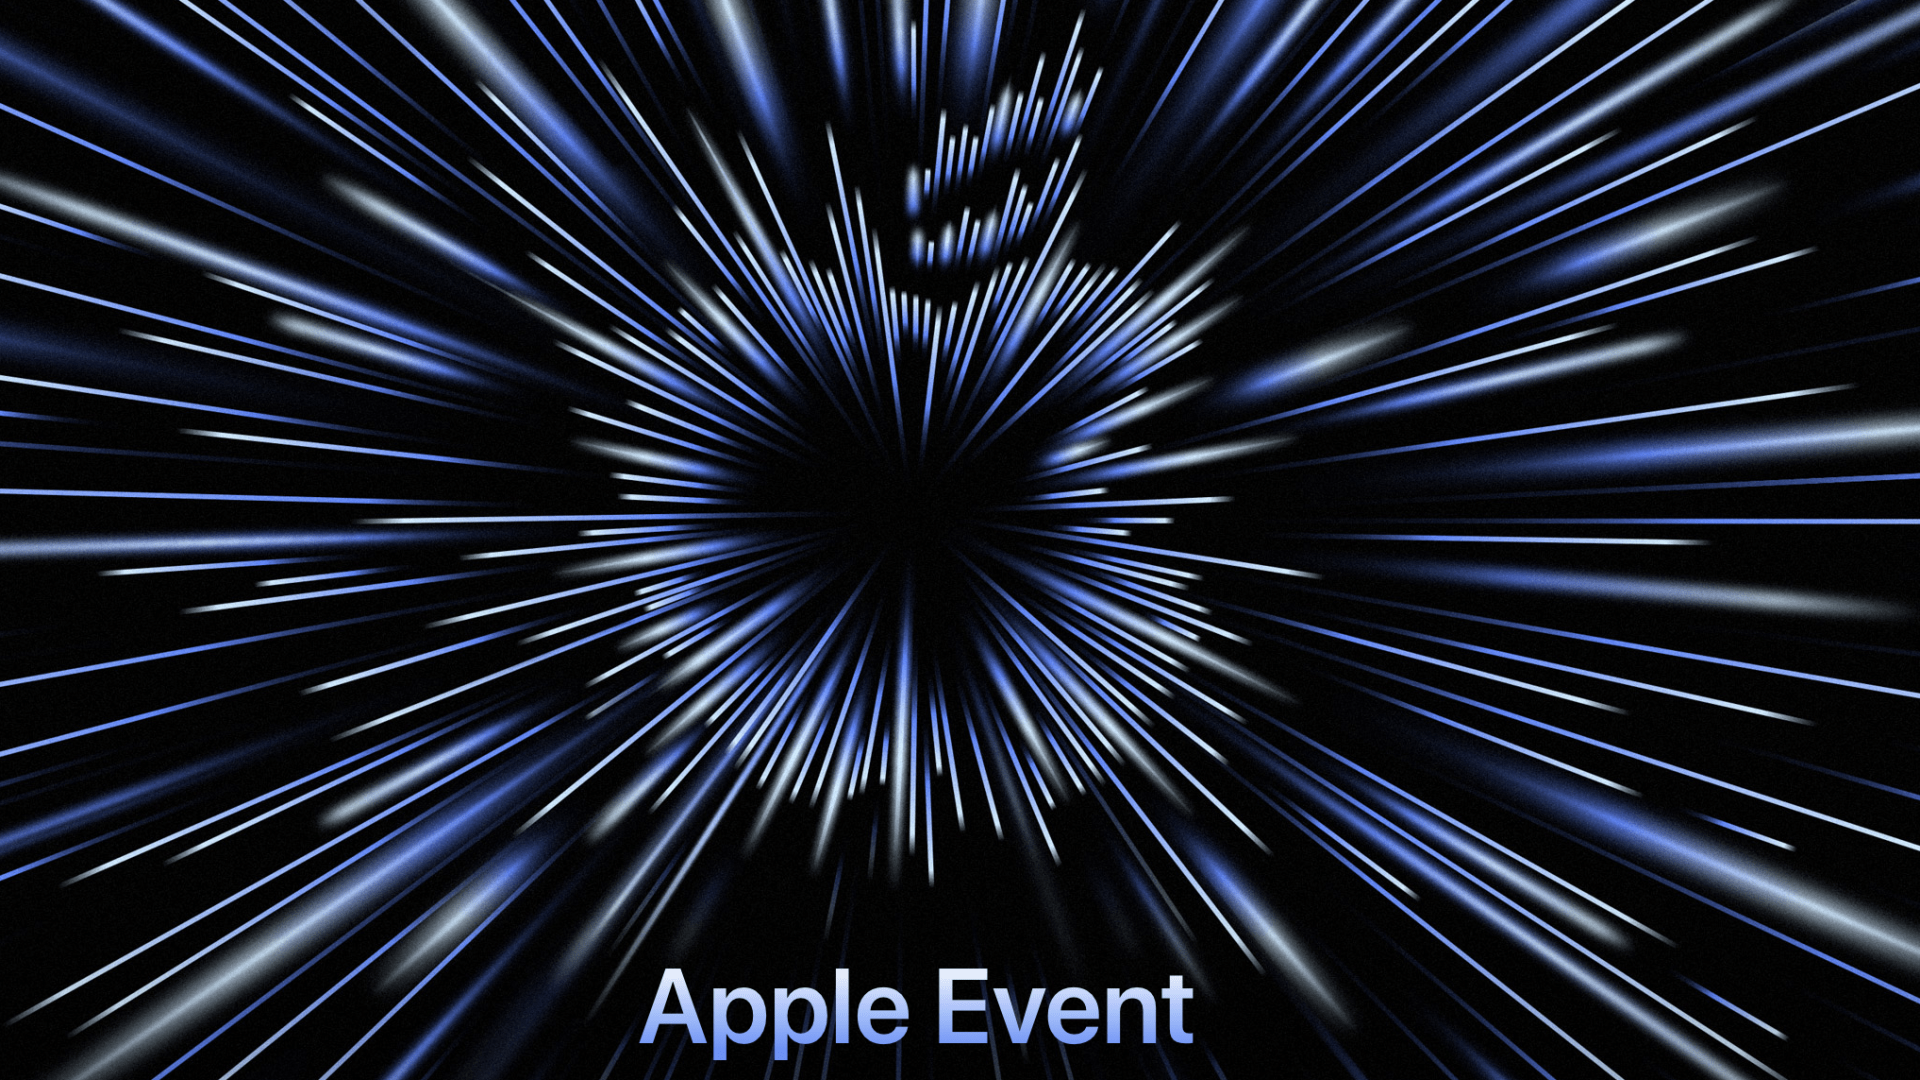 Apple, Logo, Event, Macbook, Keynote, Livestream, Einladung, Apple Event